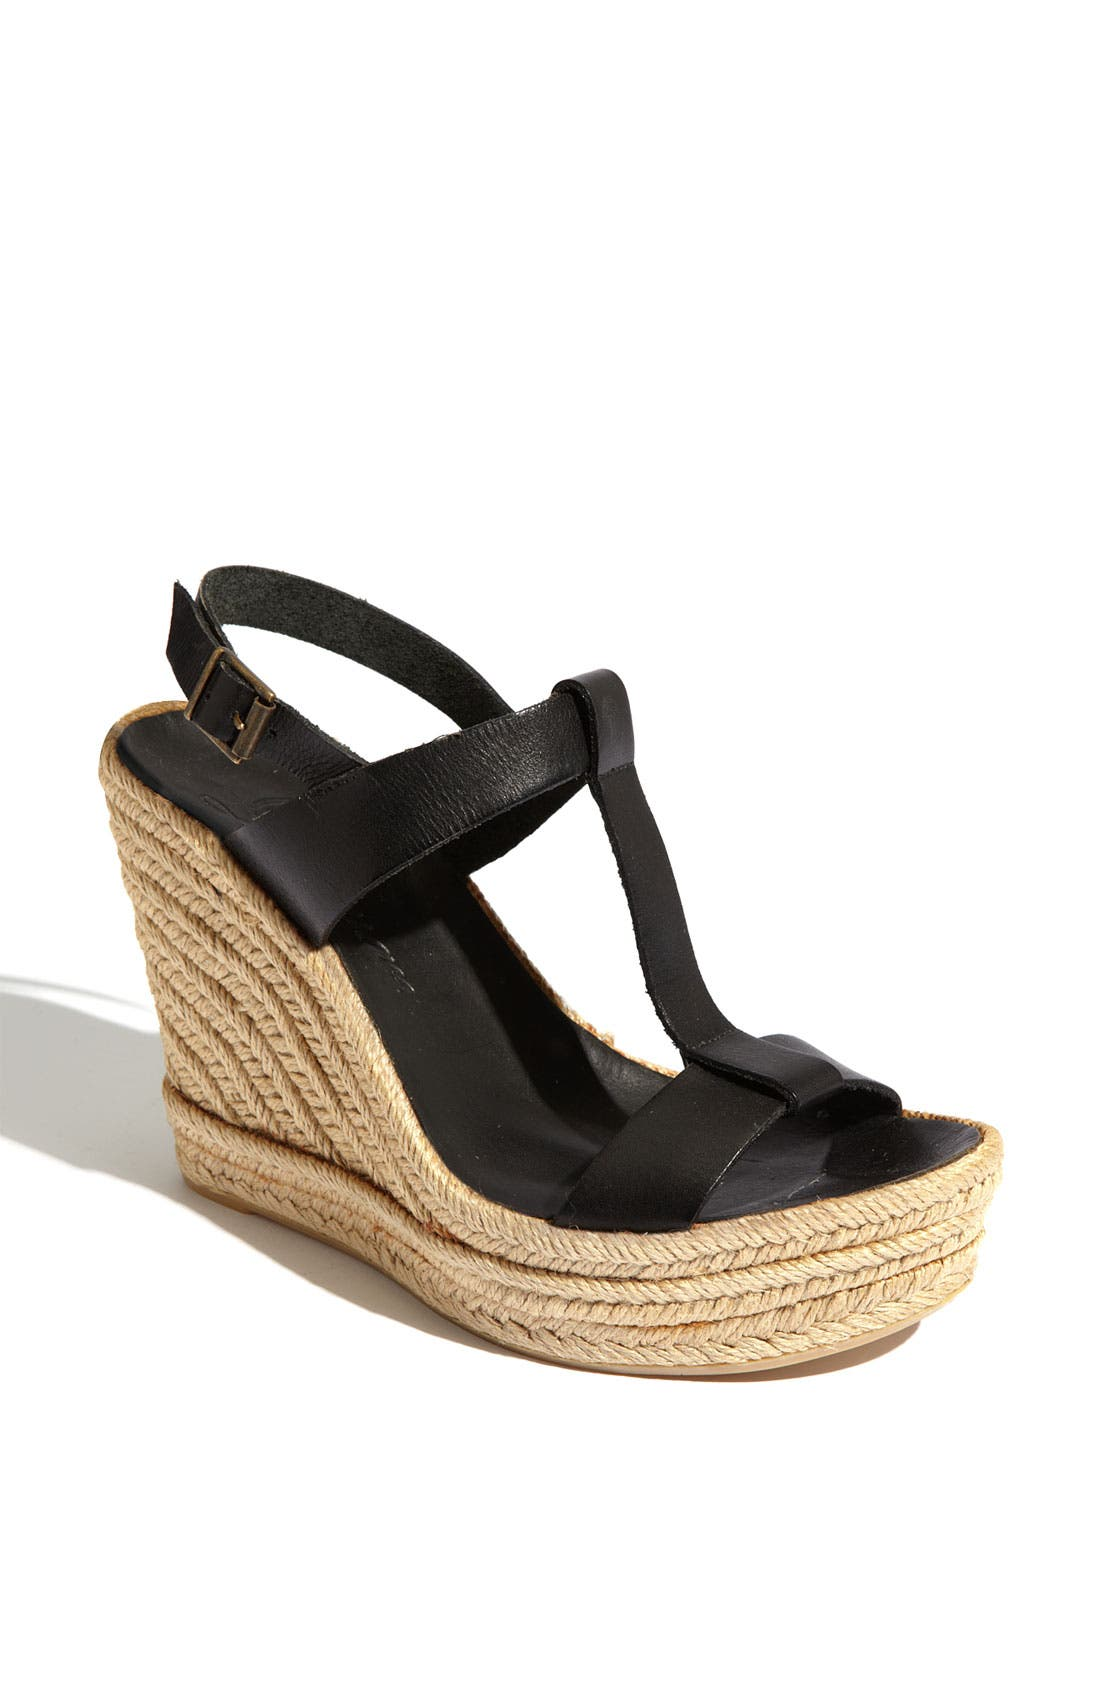 Main Image - Delman 'Trish' Sandal (Online Only)